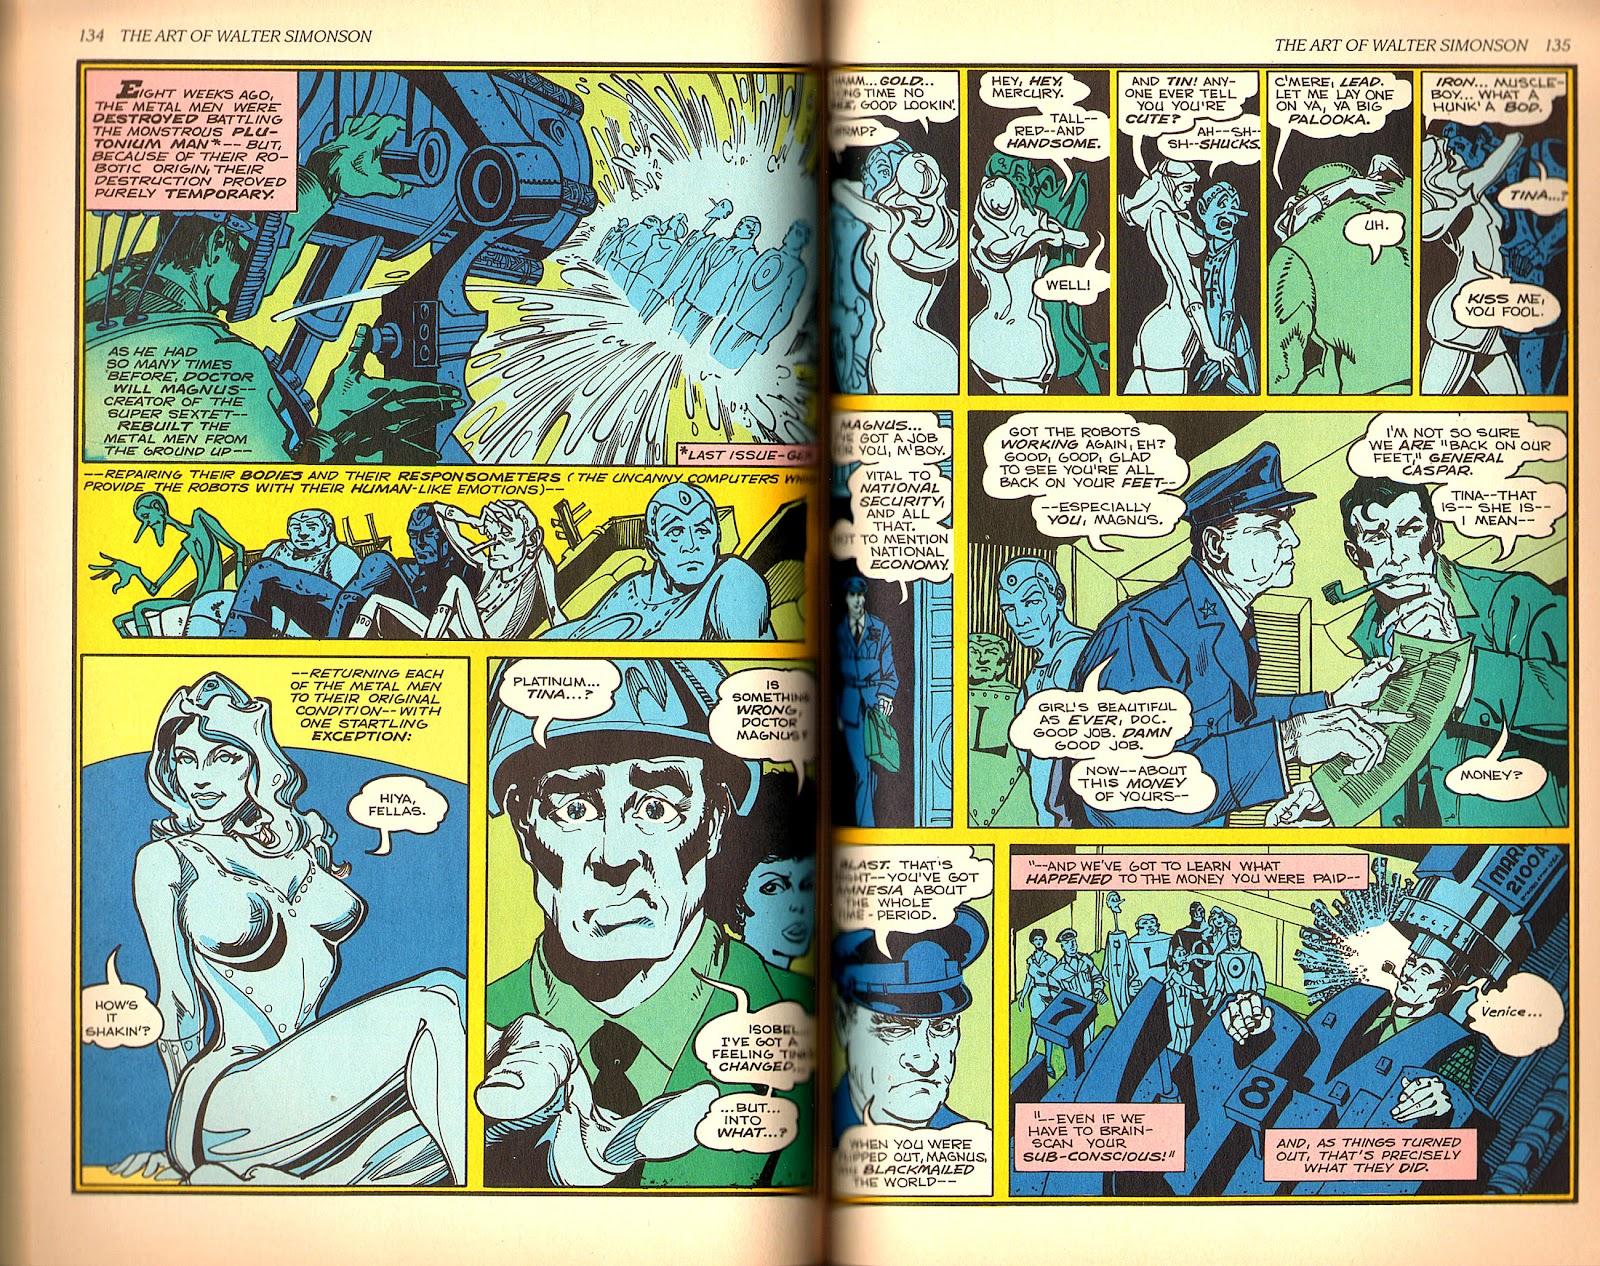 Read online The Art of Walter Simonson comic -  Issue # TPB - 69